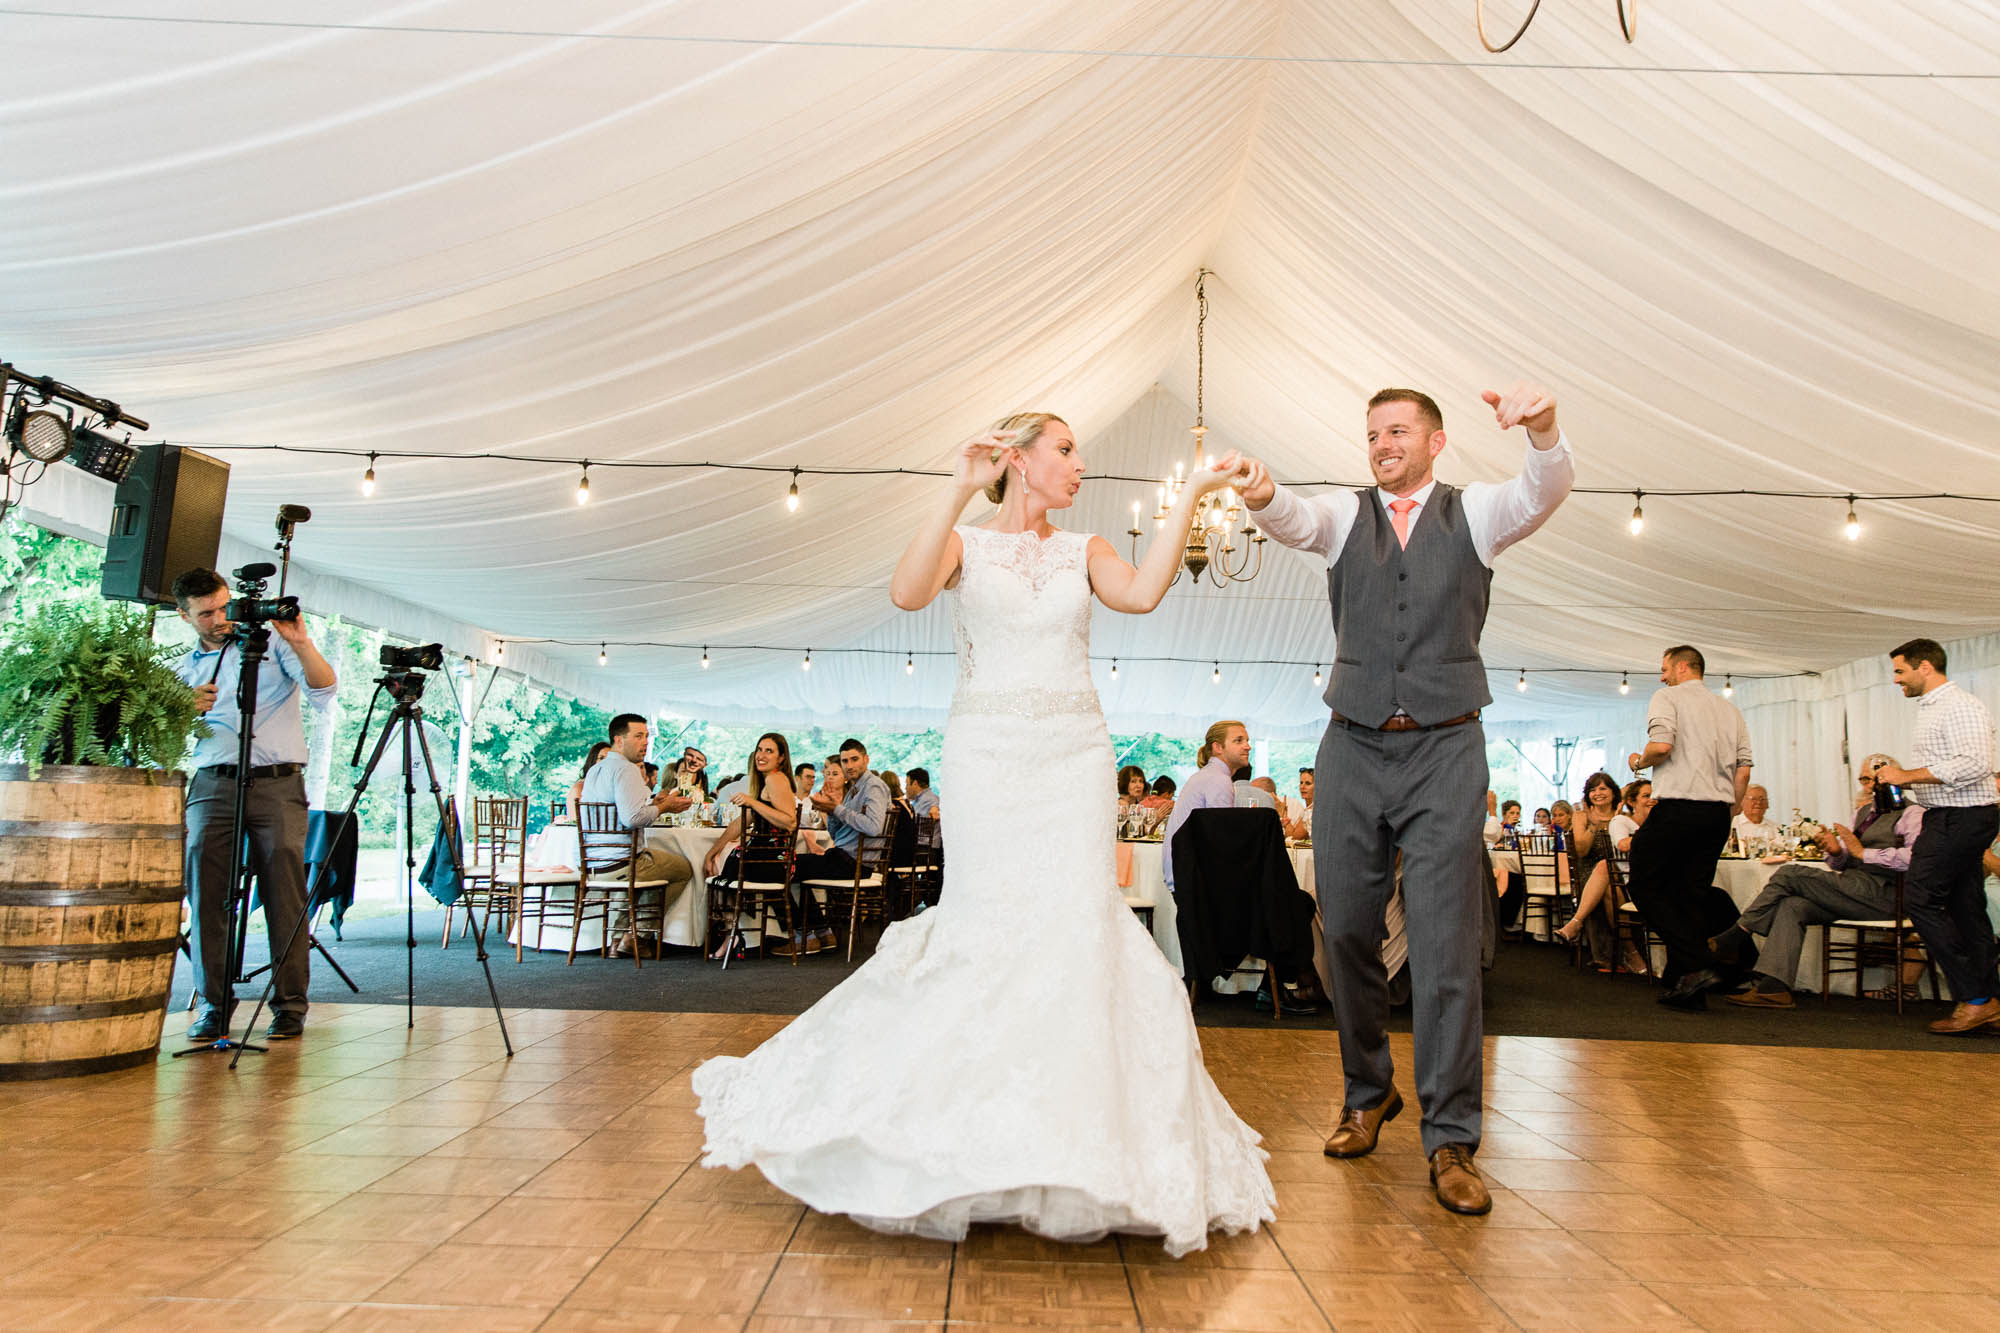 Allenberry-resort-historic-pennsylvania-wedding-10478.jpg